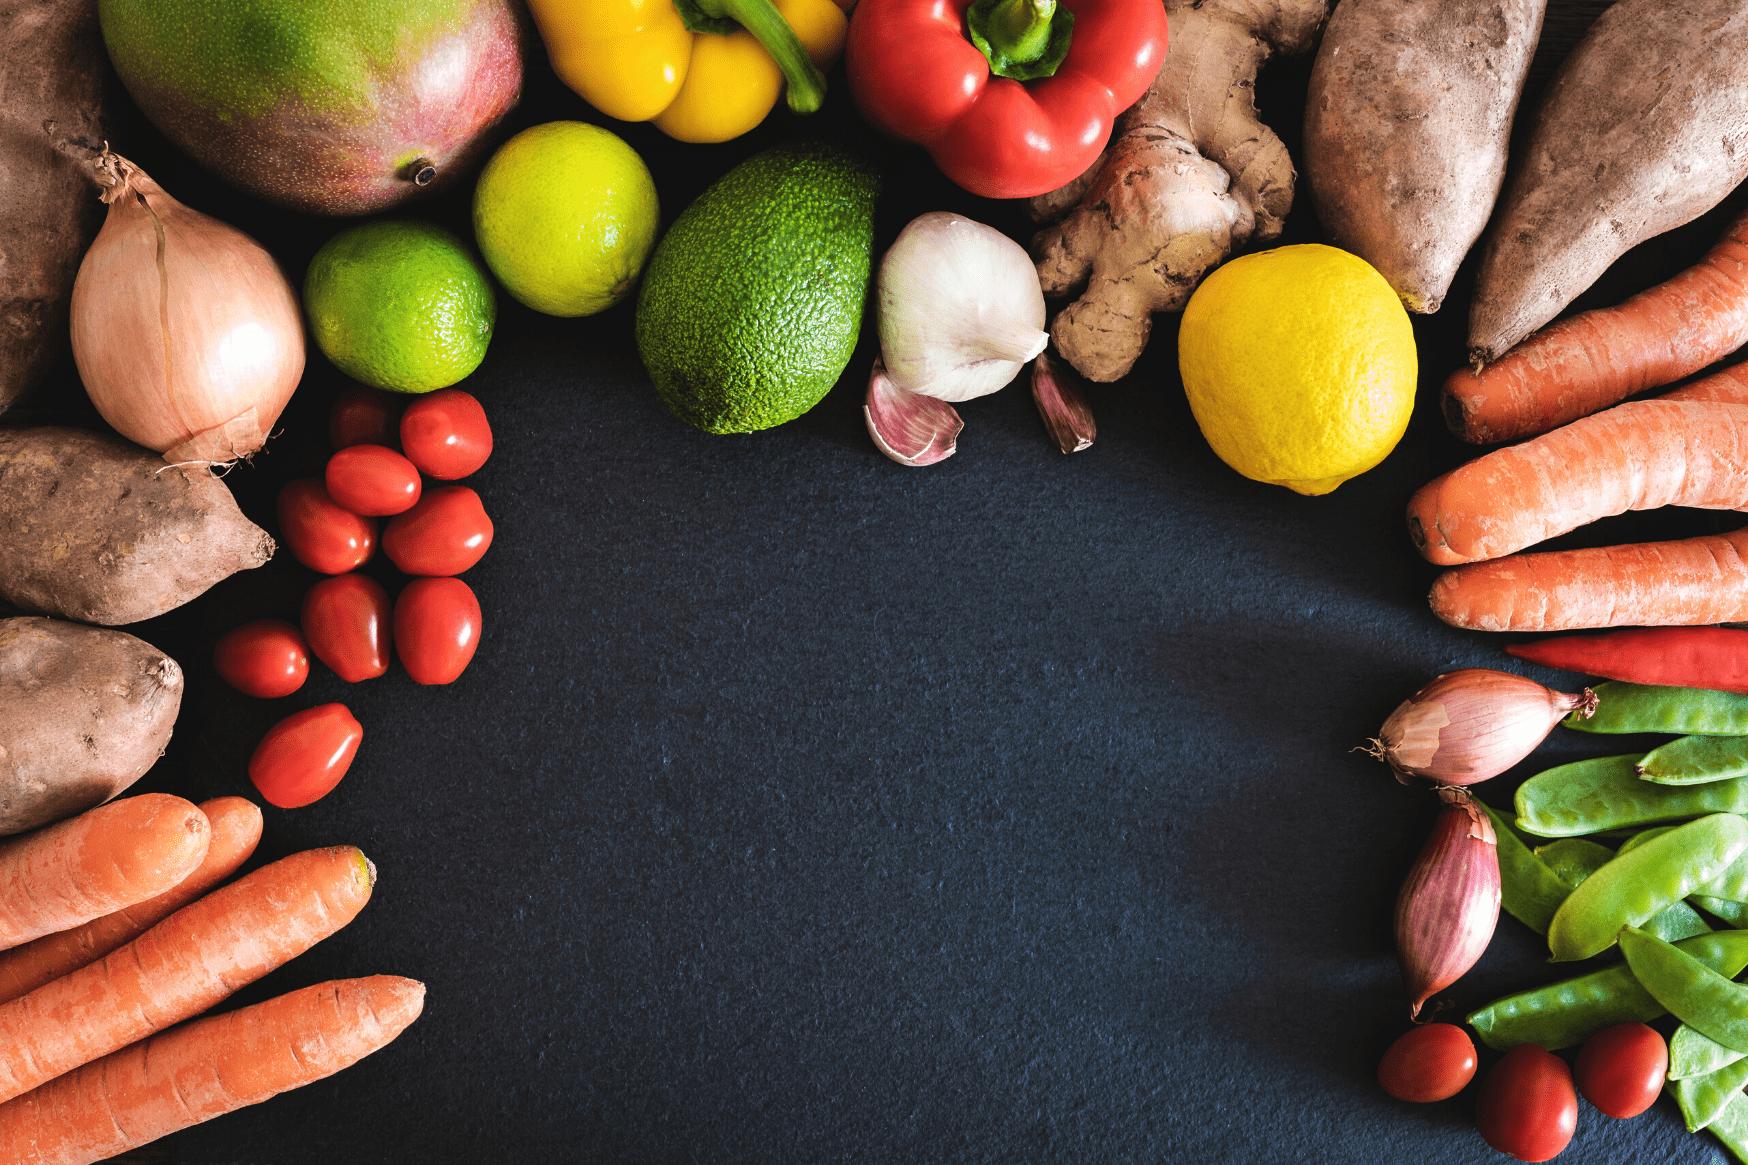 fruits, légumes, banane, exotiques, mûrir, fruits à noyau, tomates, agrumes, raisins